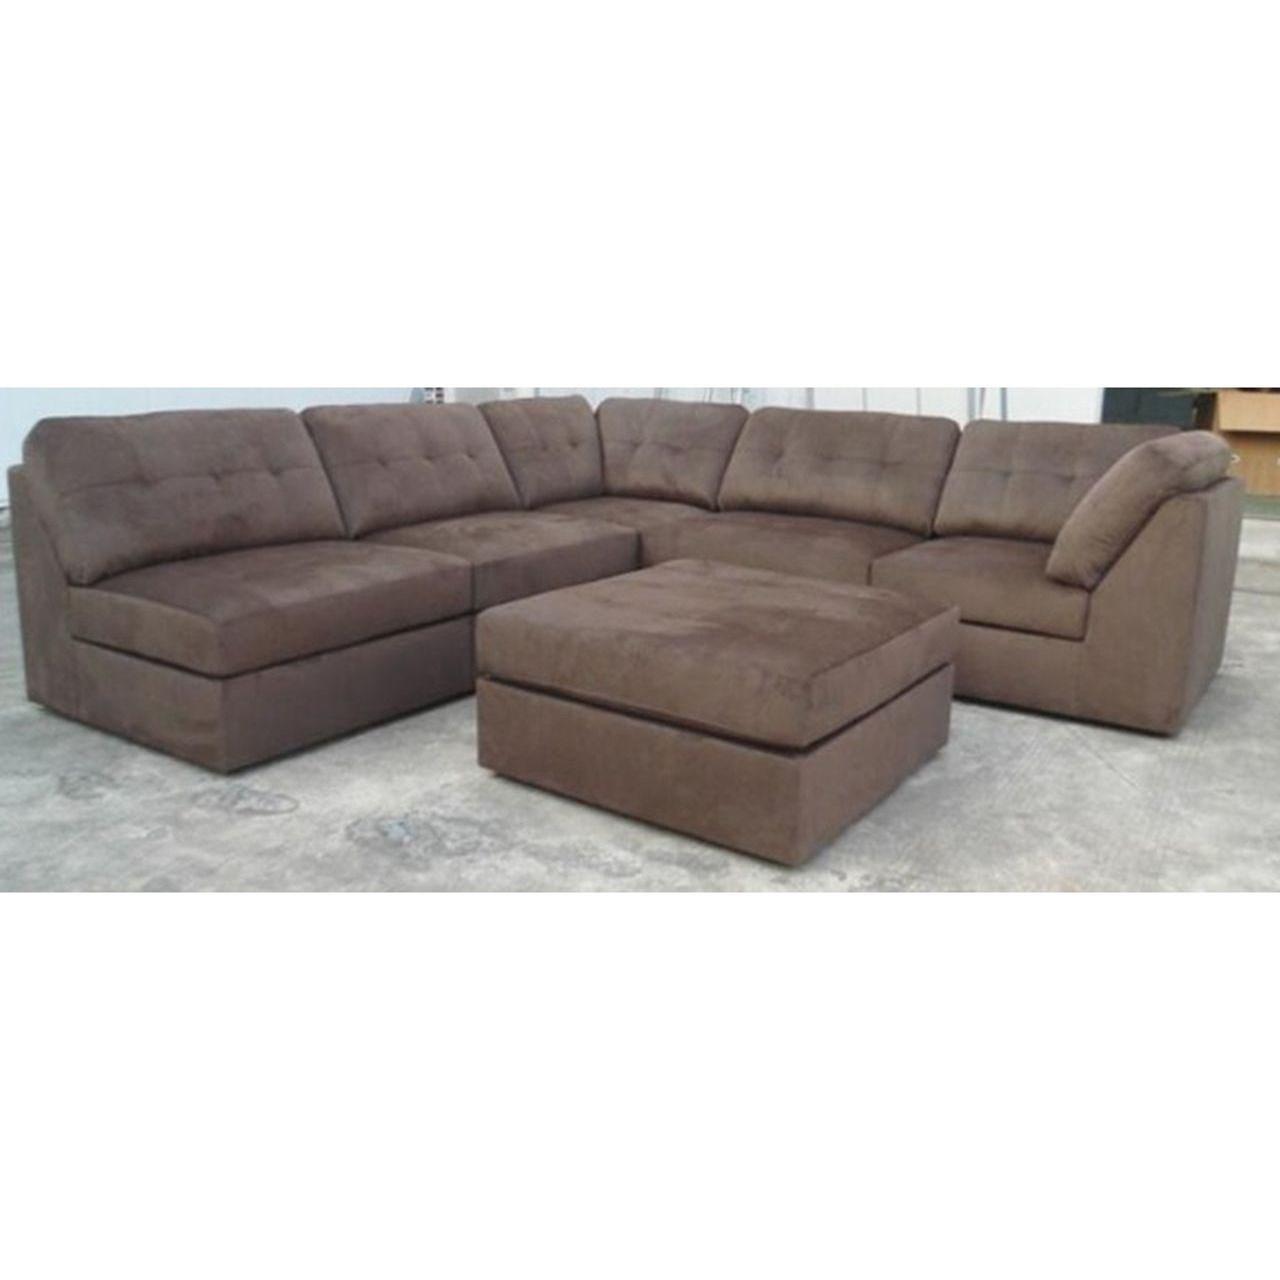 Lifestyle U9377 Casual Sectional Sofa